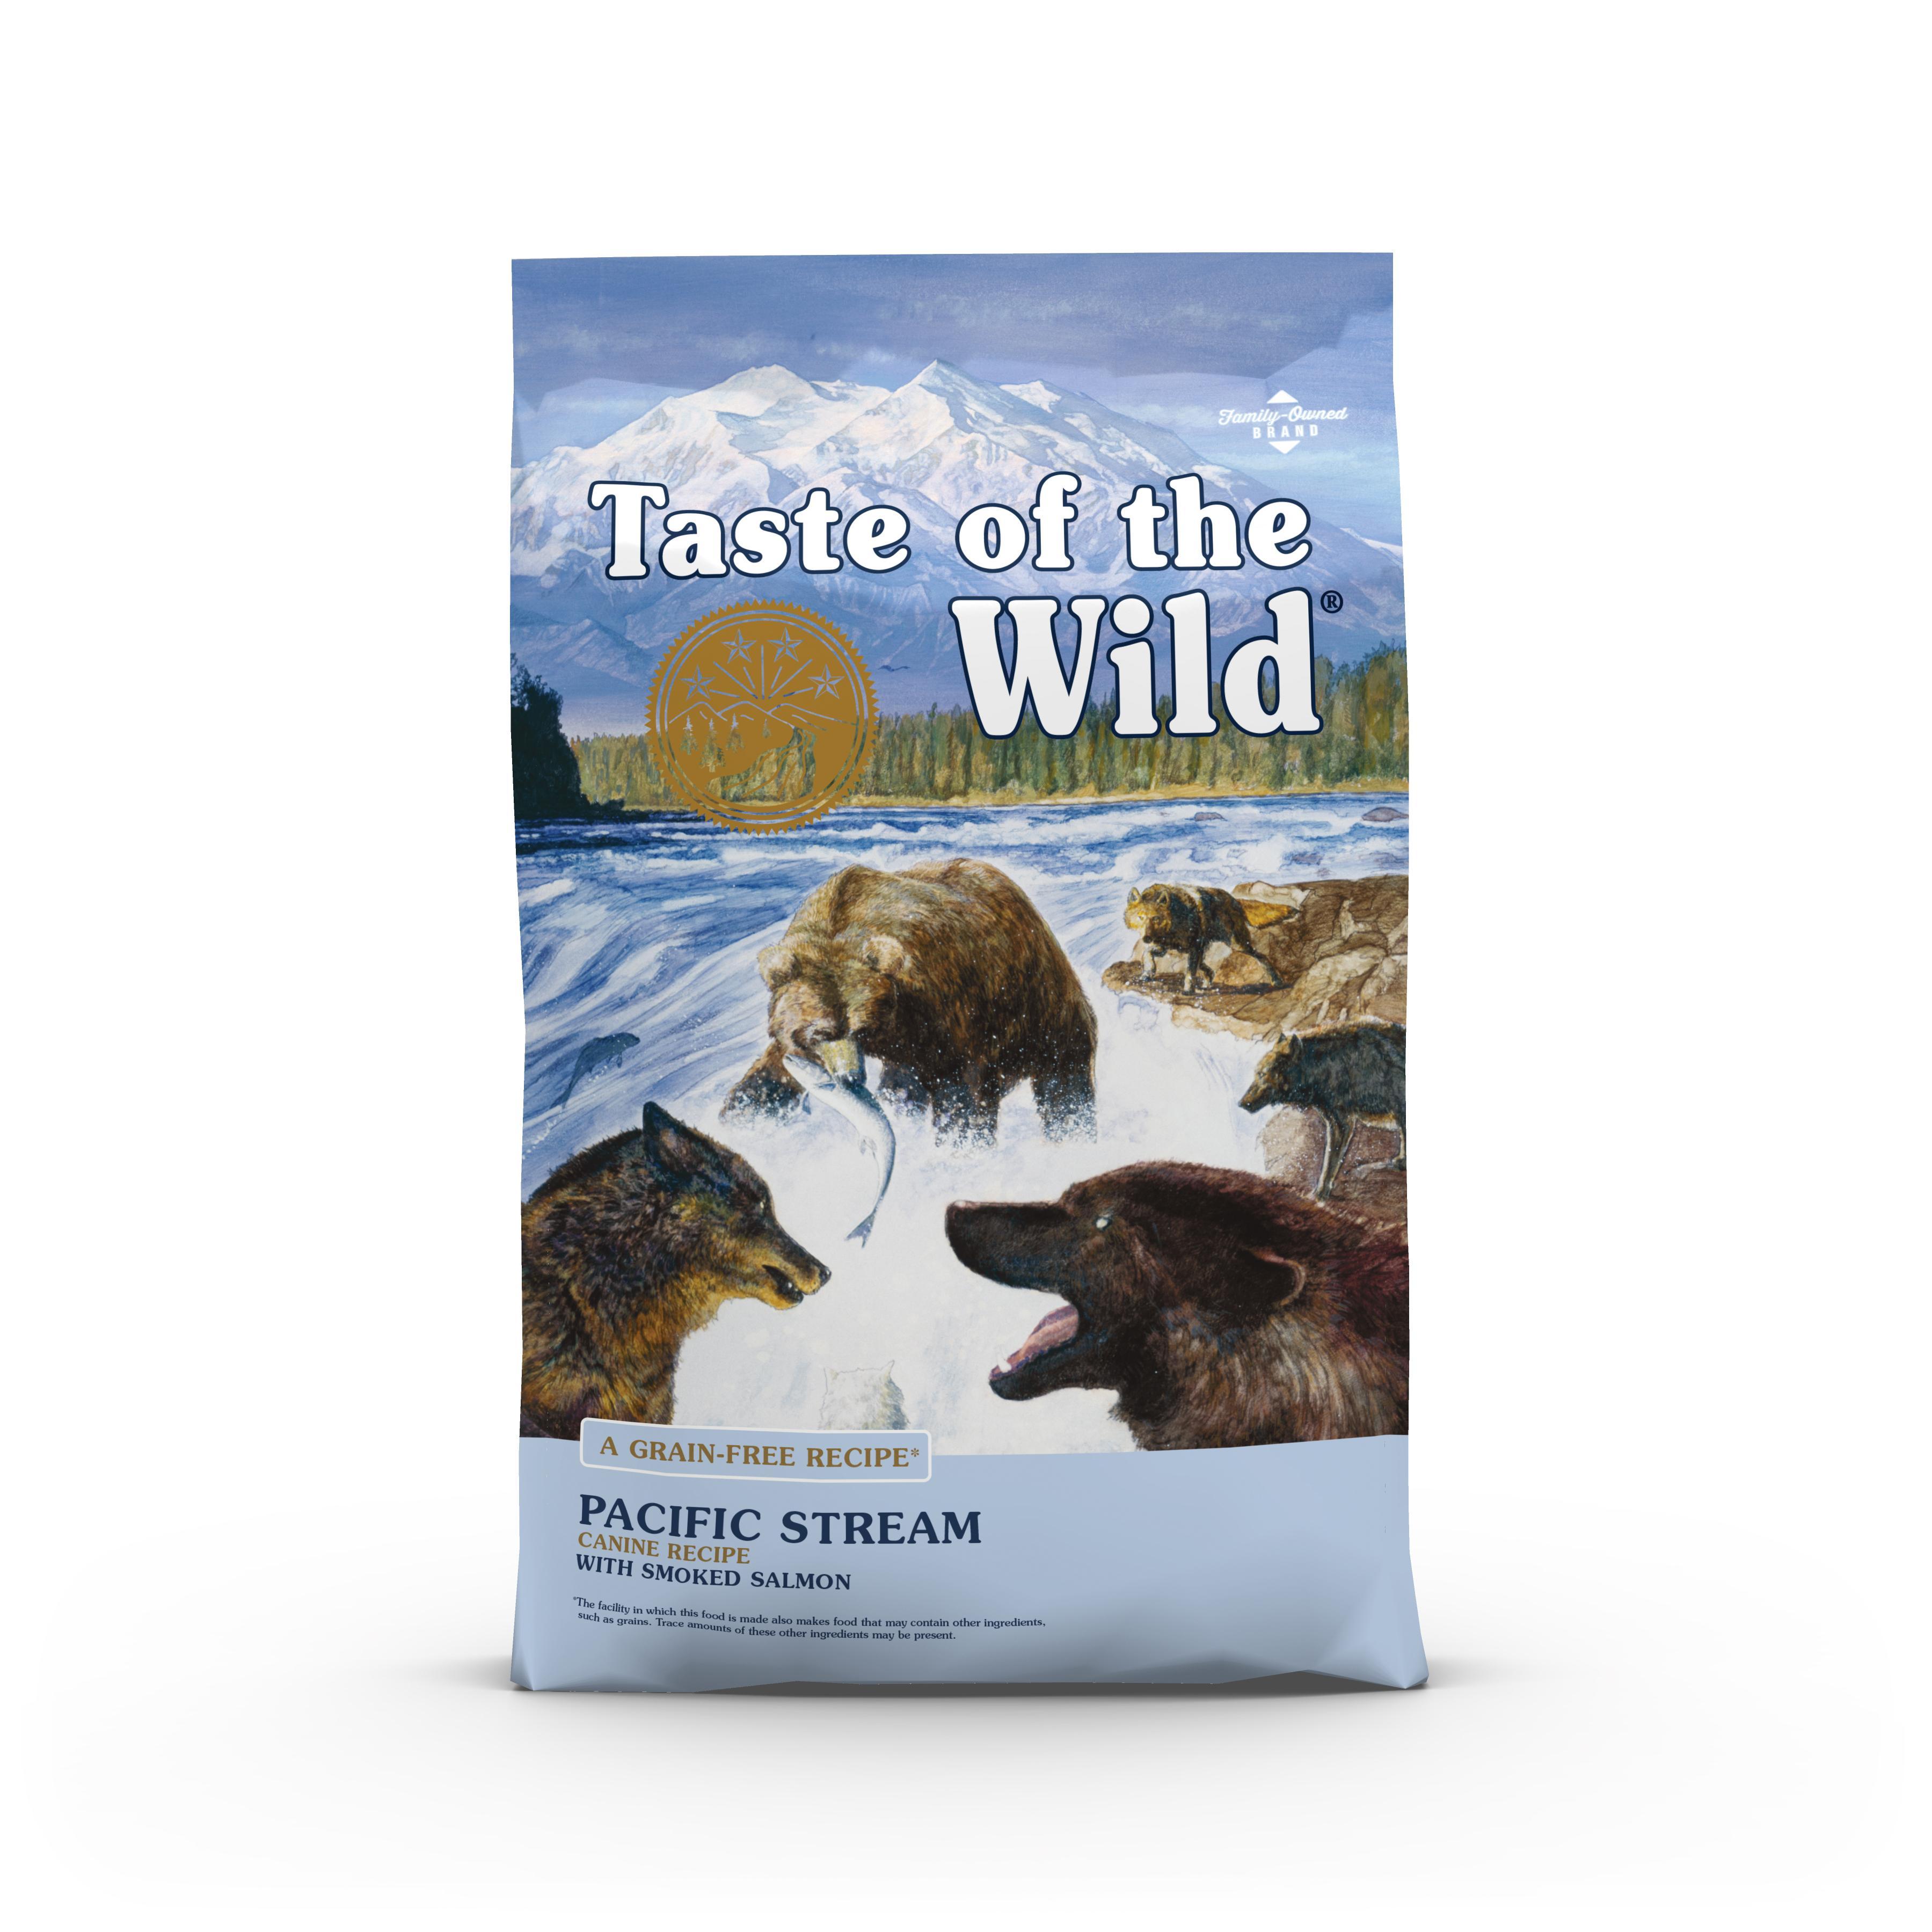 Taste of the Wild Pacific Stream Grain-Free Dry Dog Food, 5-lb